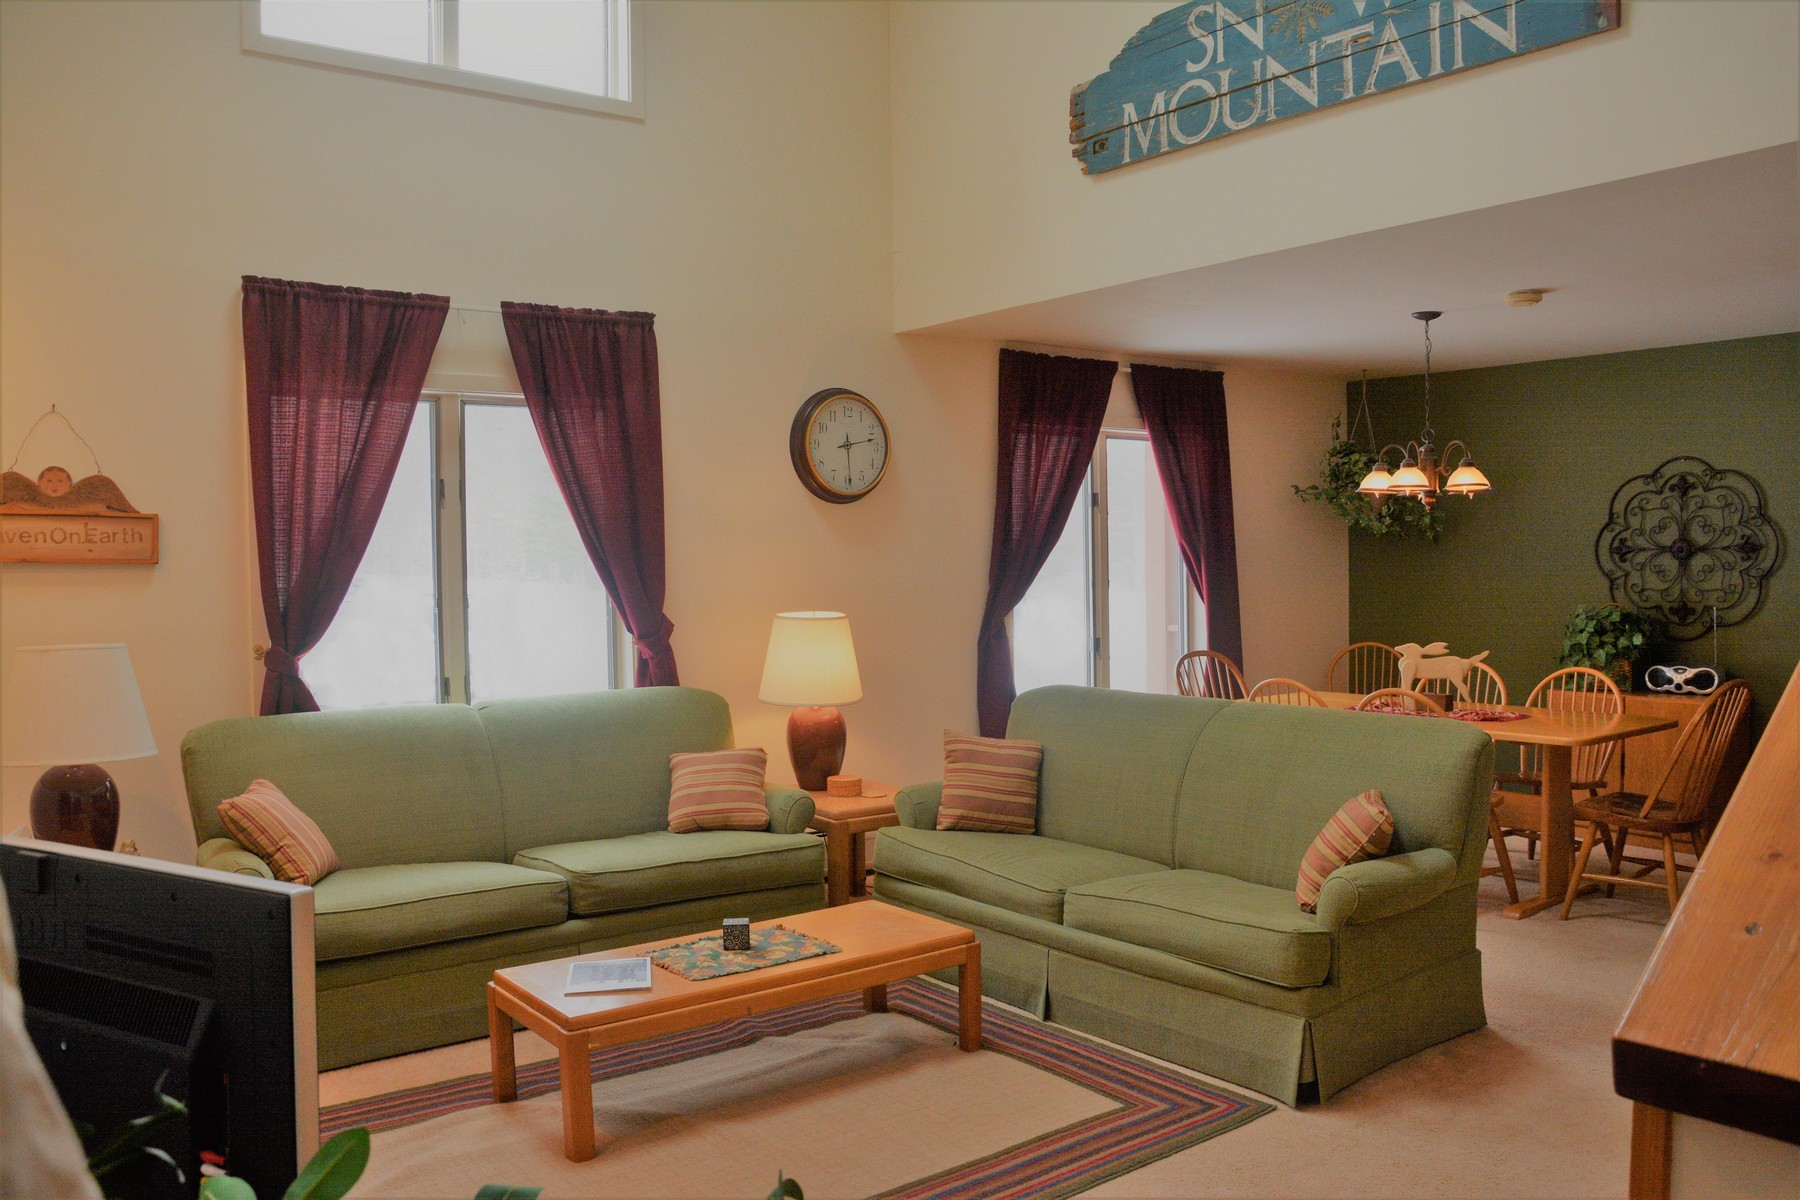 شقة بعمارة للـ Sale في 228 Snow Mountain Village, Dover Dover, Vermont, 05356 United States